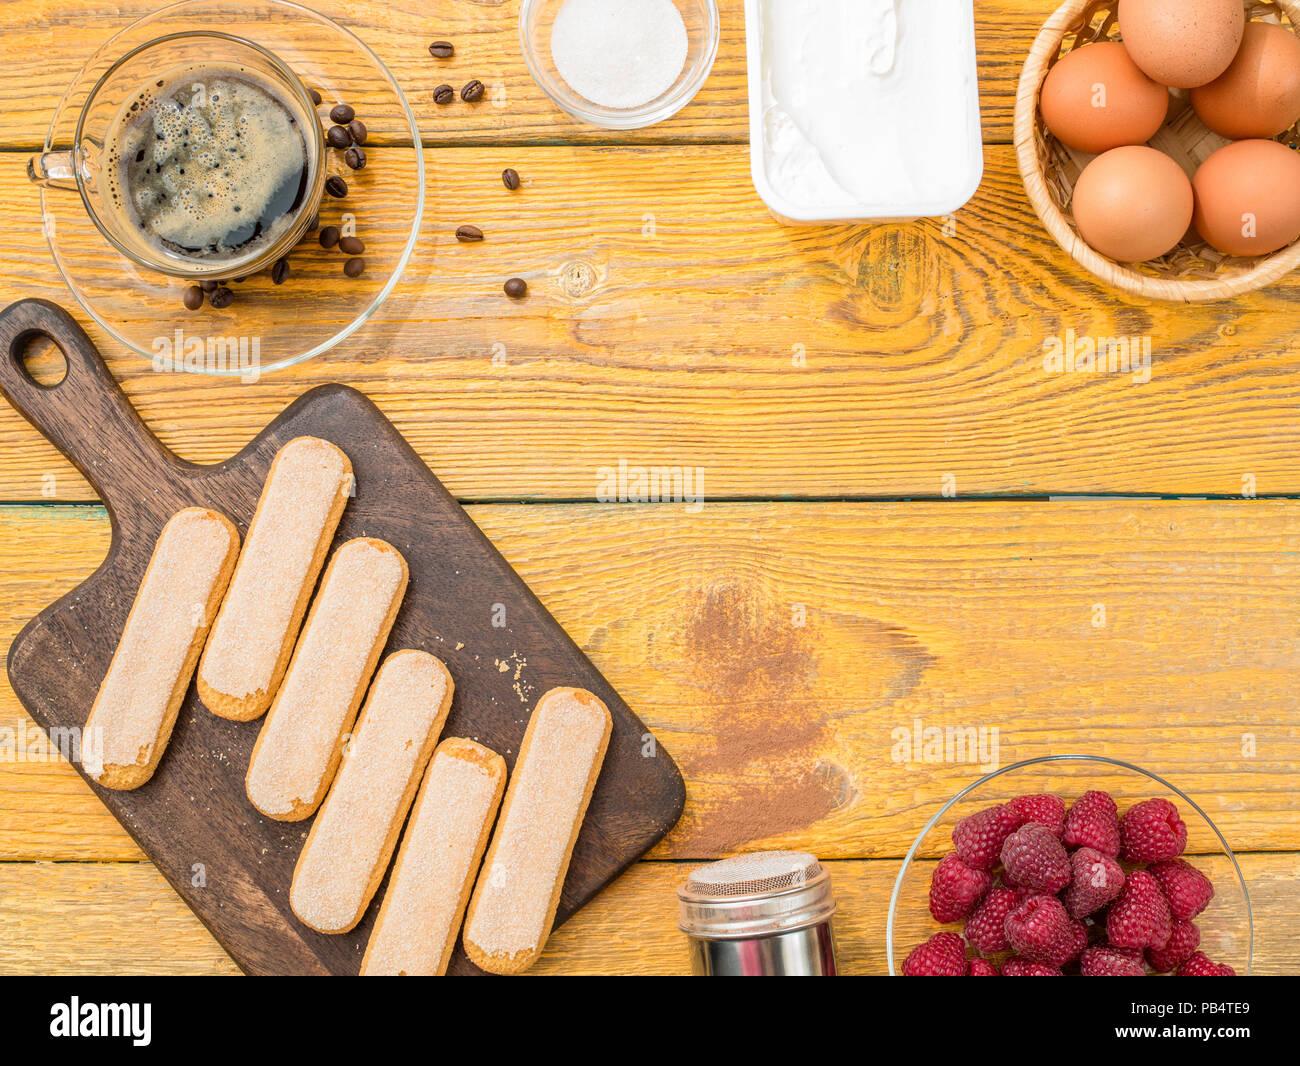 Foto oben auf Tabelle mit Gebäck, Eier, Himbeeren Stockbild